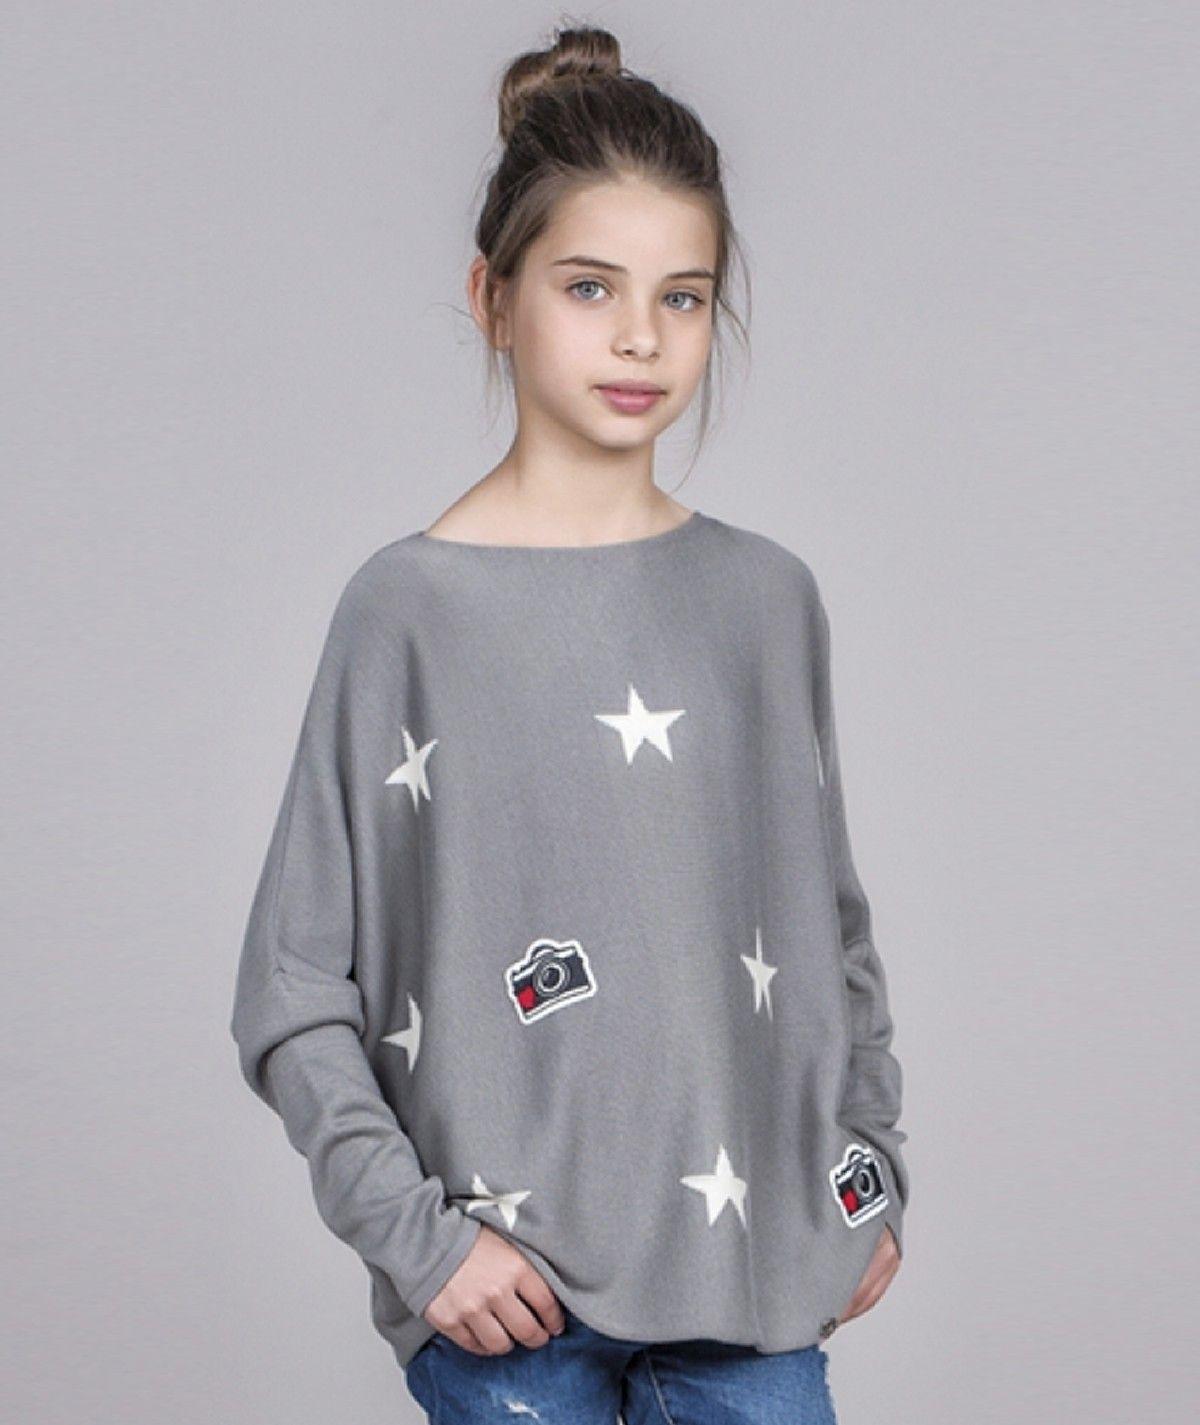 Camisola  estrelas  KIDS